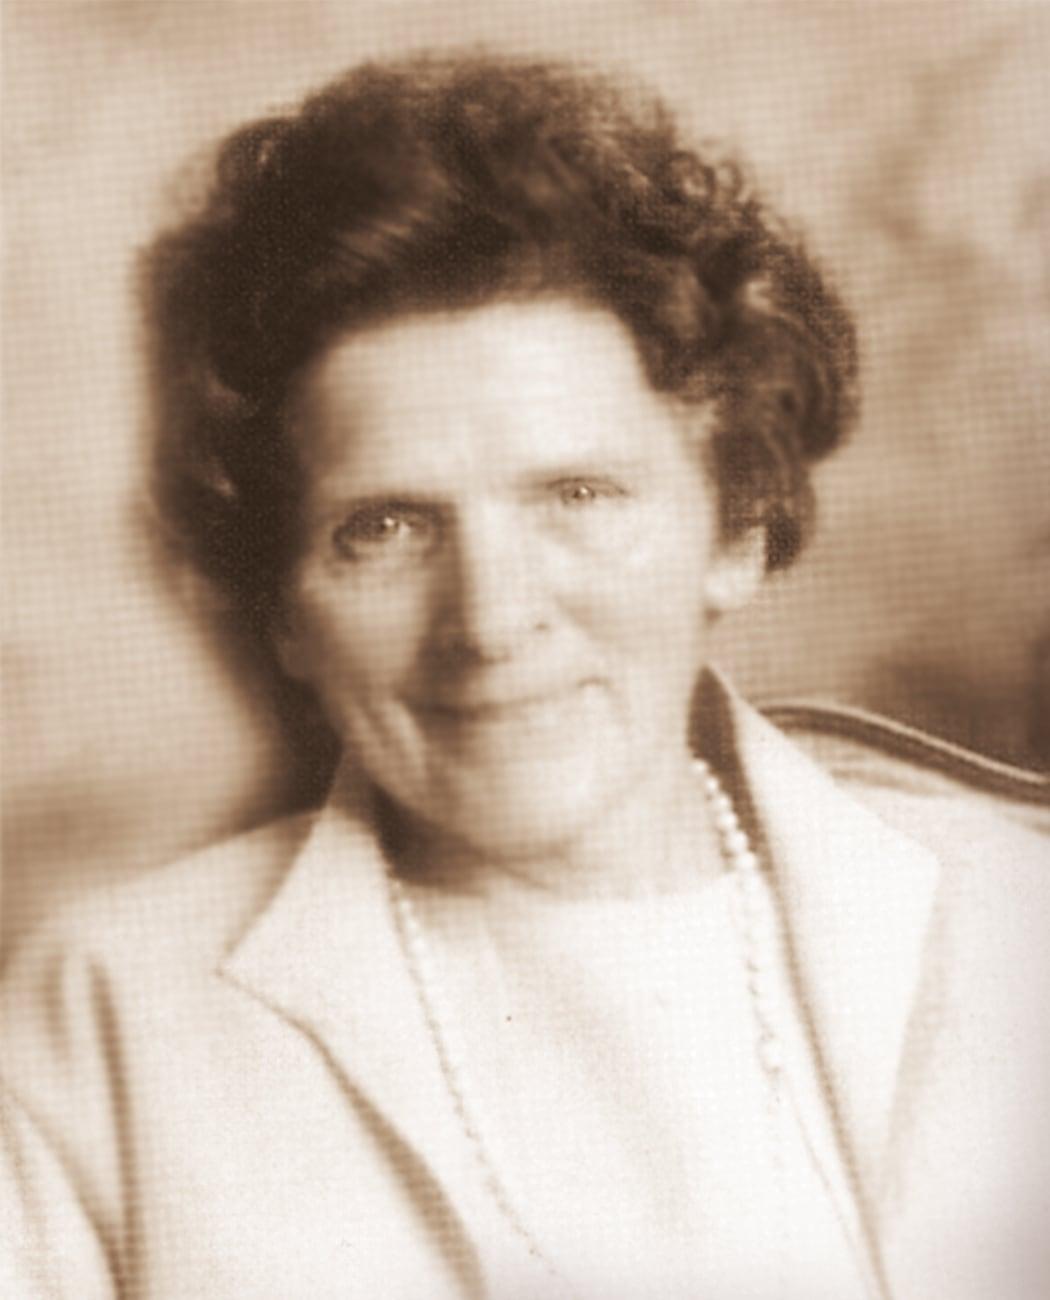 Erna Knollenborg Ehefrau von Erich Knollenborg